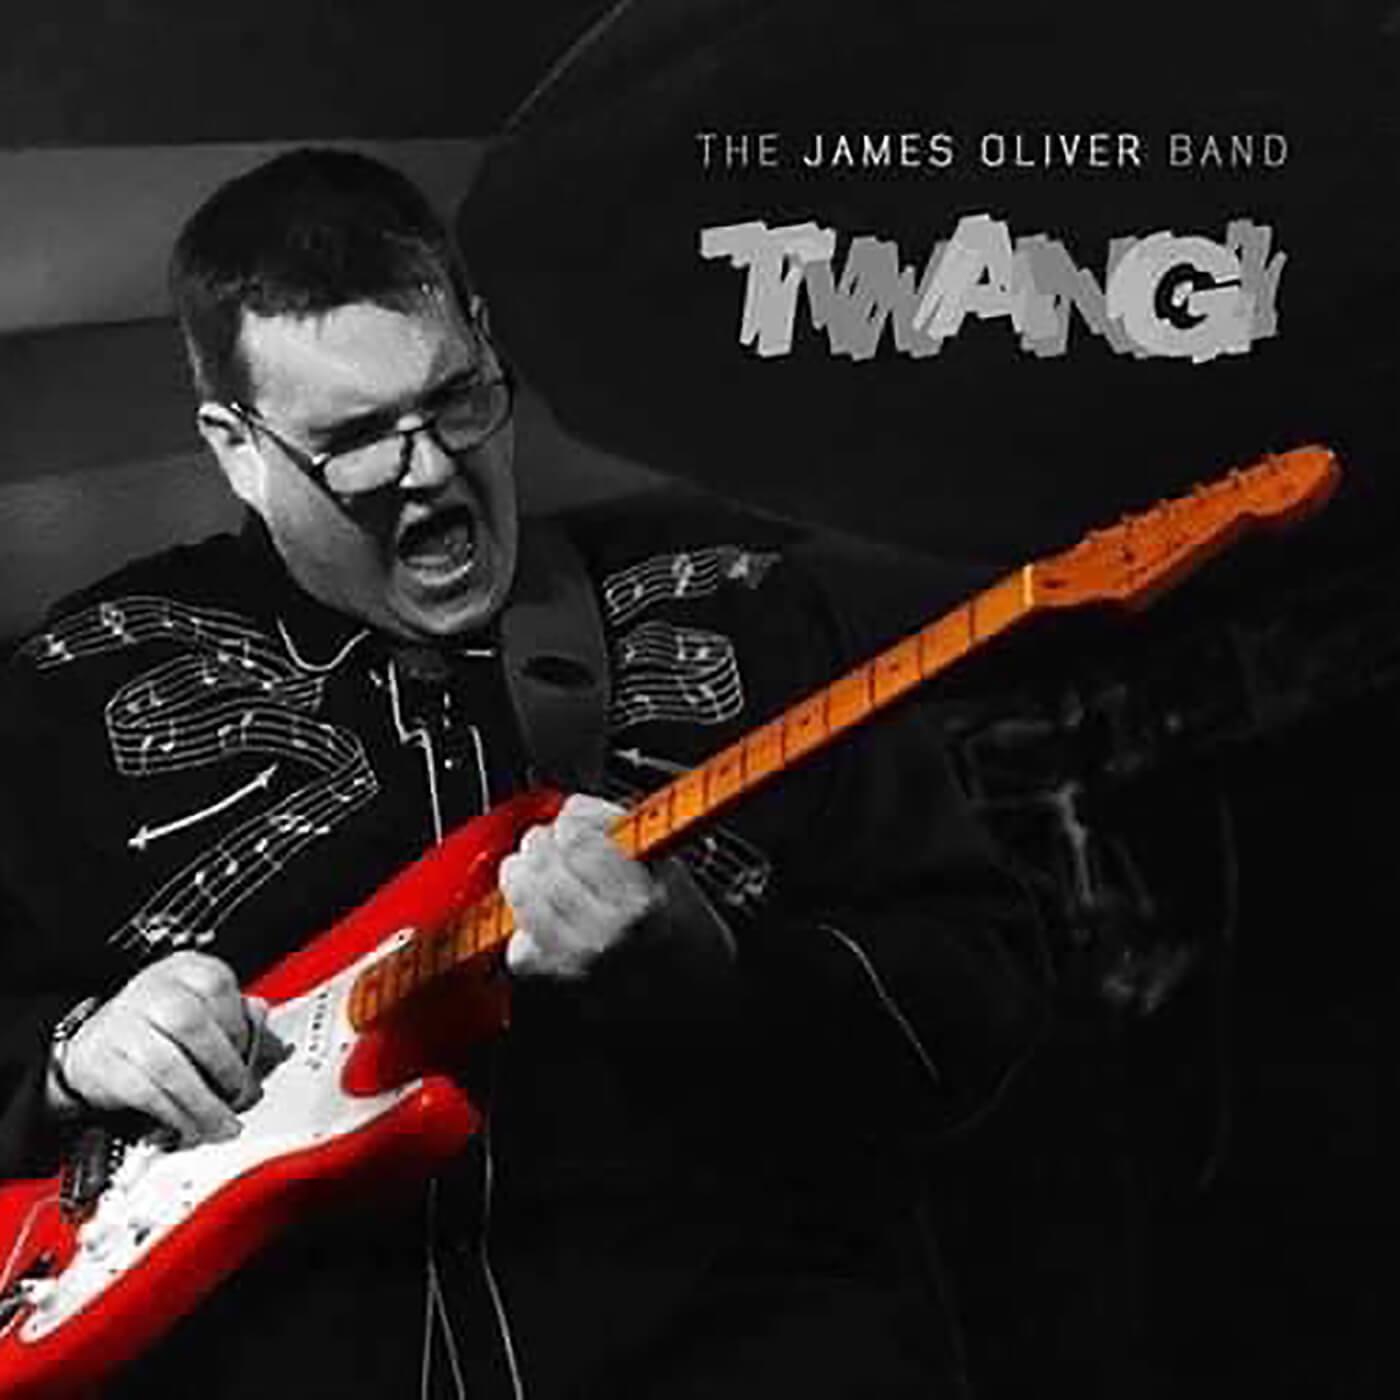 James Oliver - Twang!